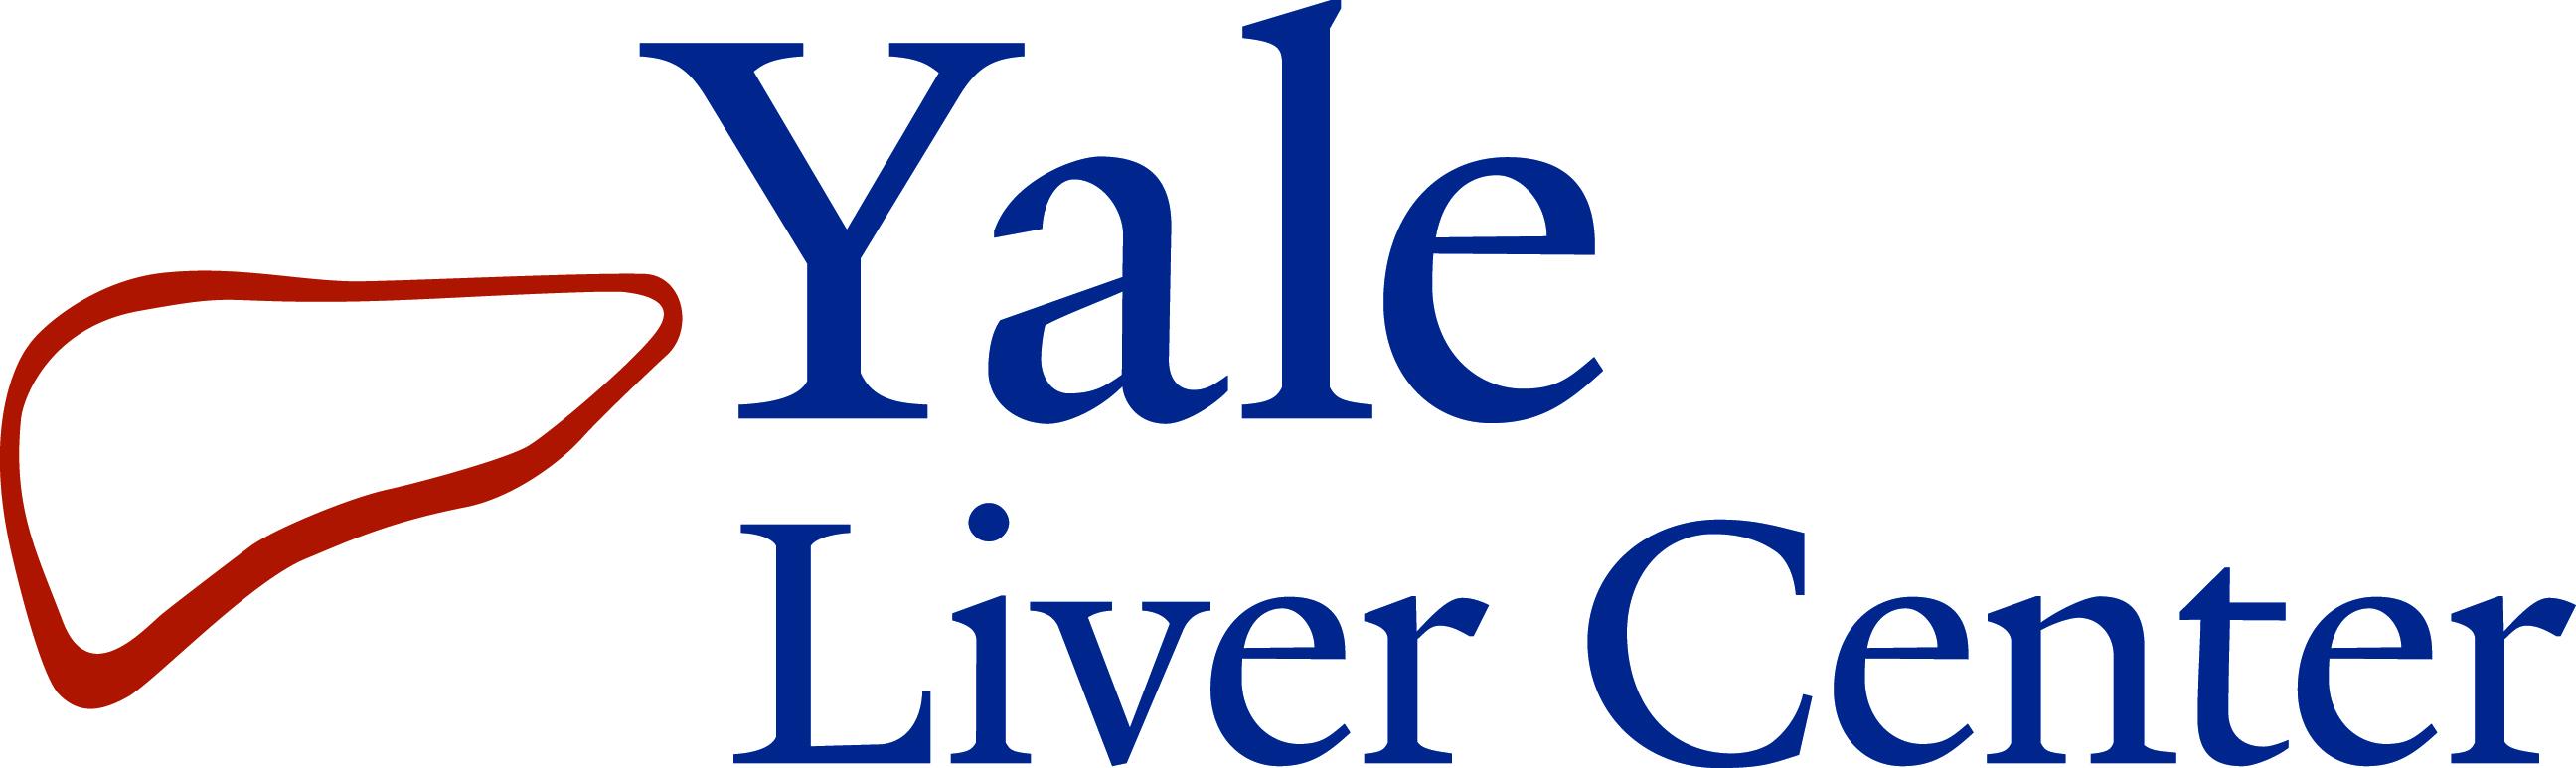 YaleLiverCenter